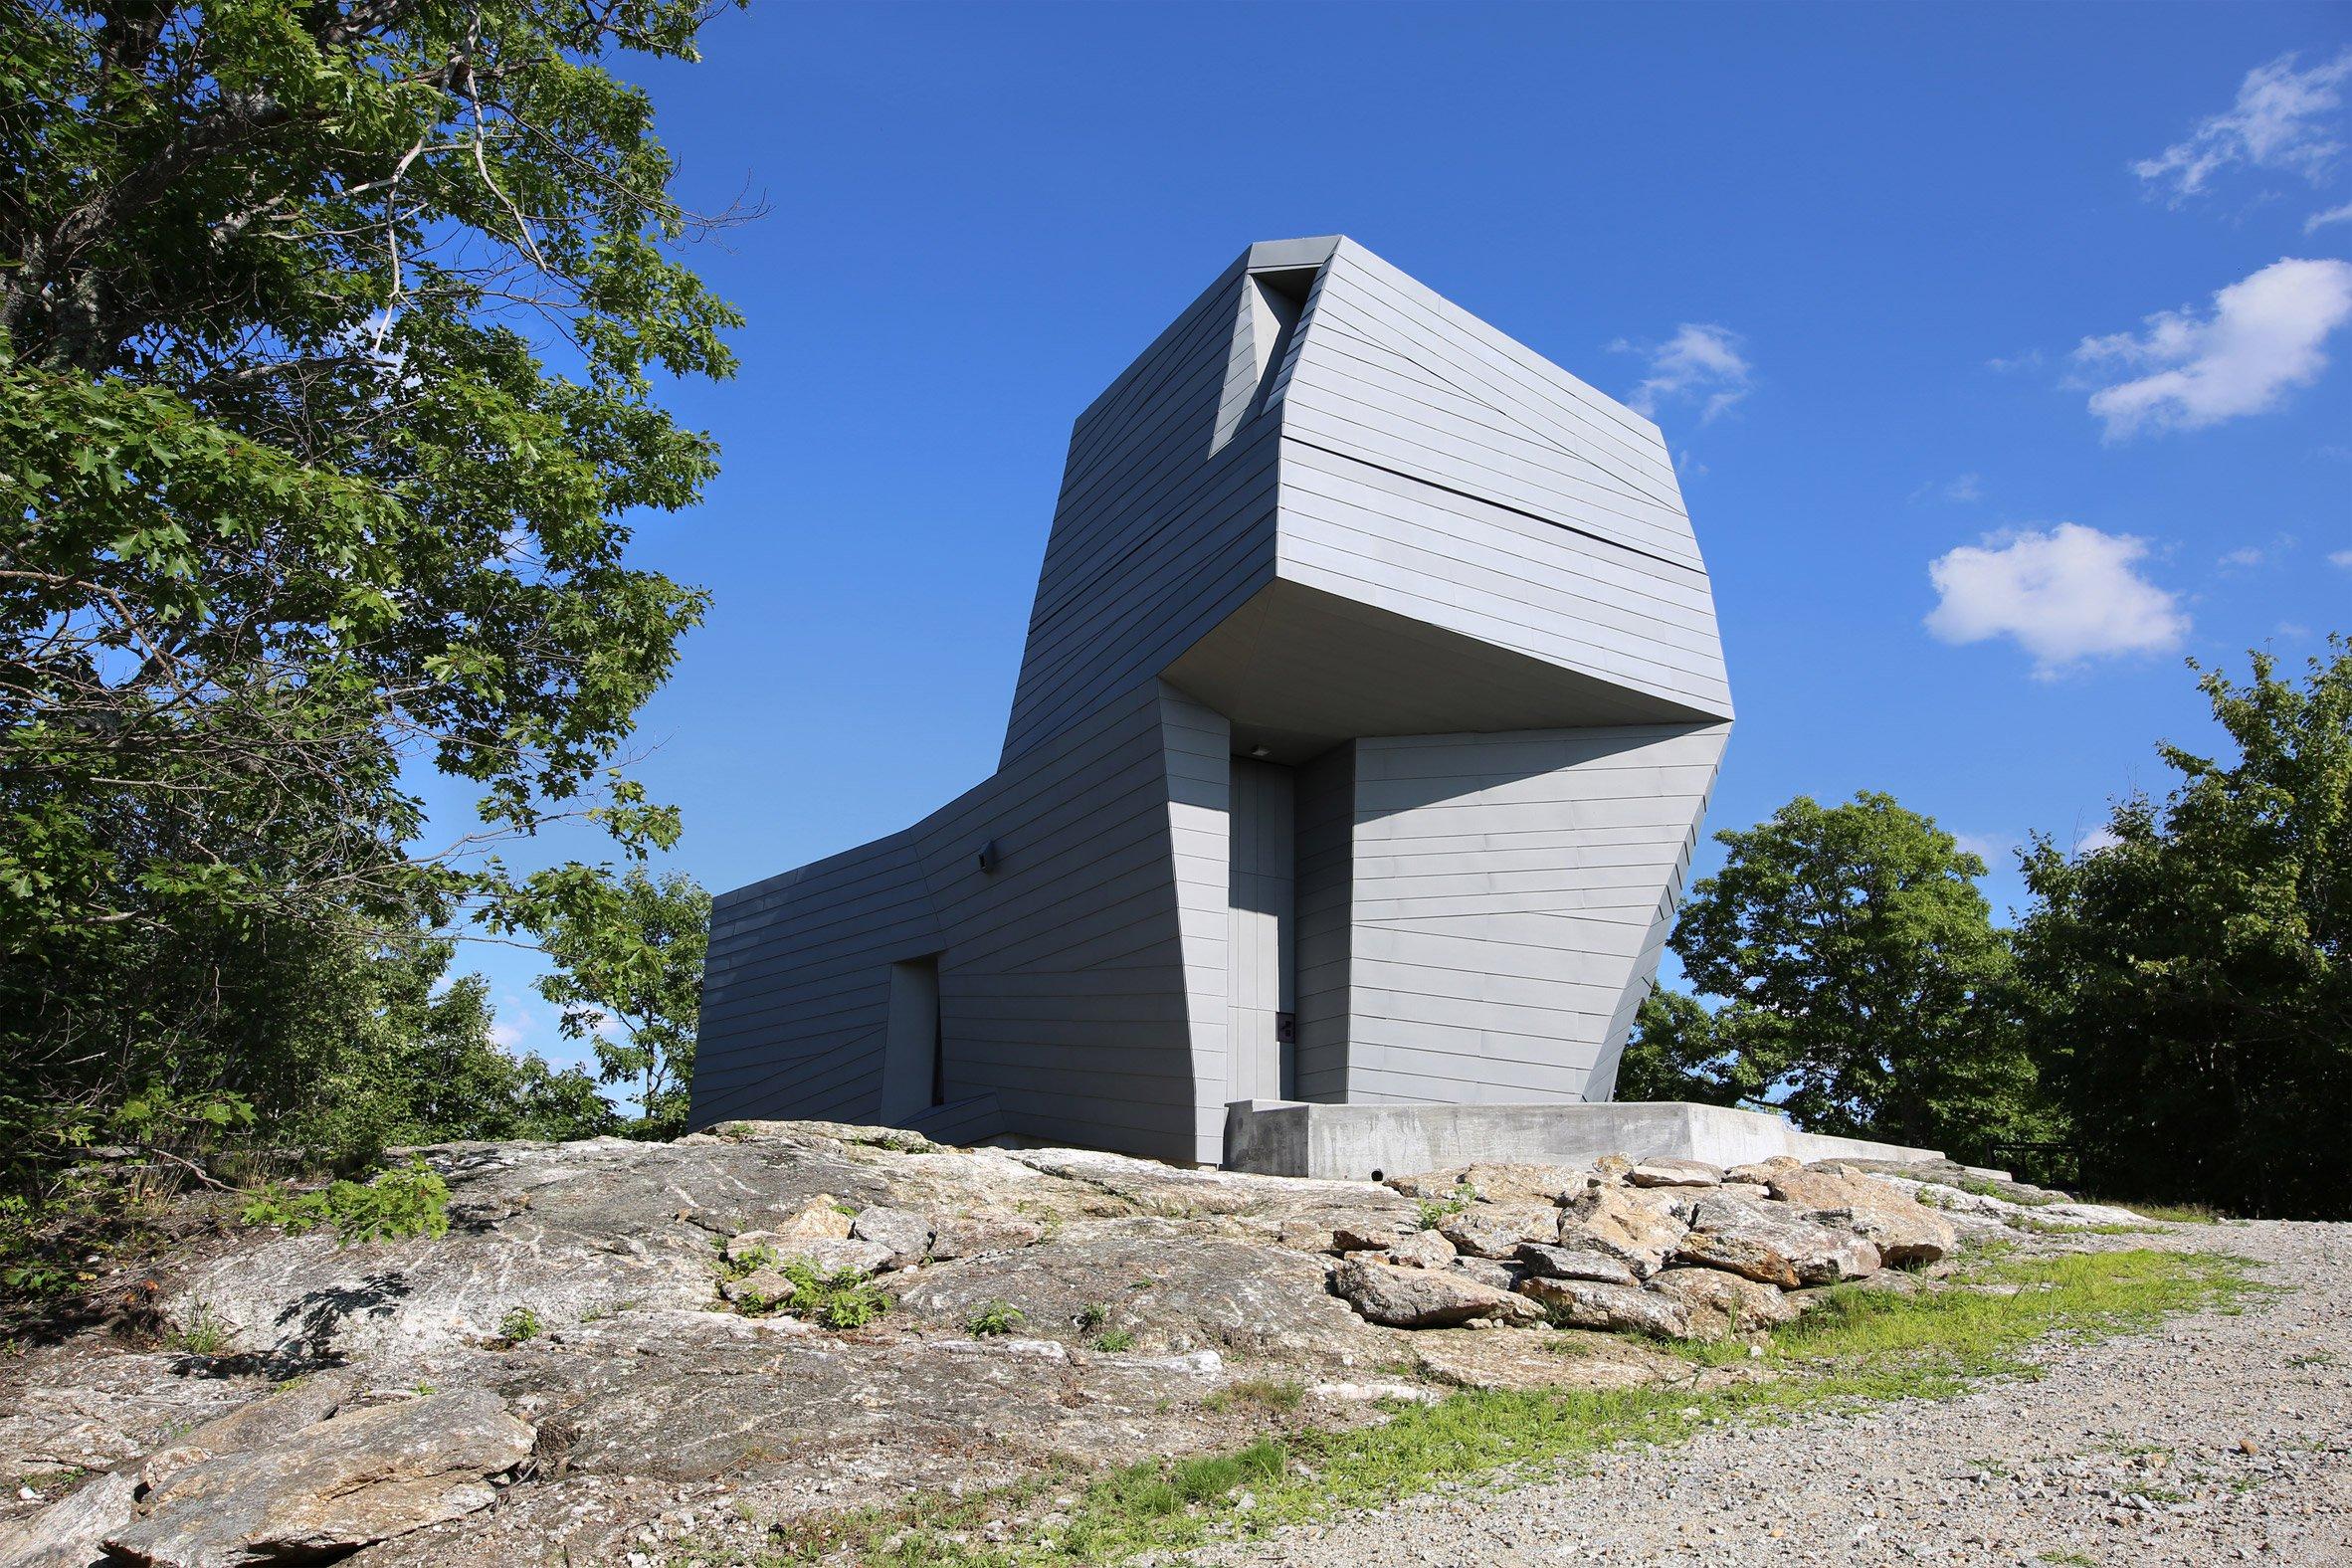 gemma-observatory-anmahian-winton-architects_dezeen_2364_col_0.jpg